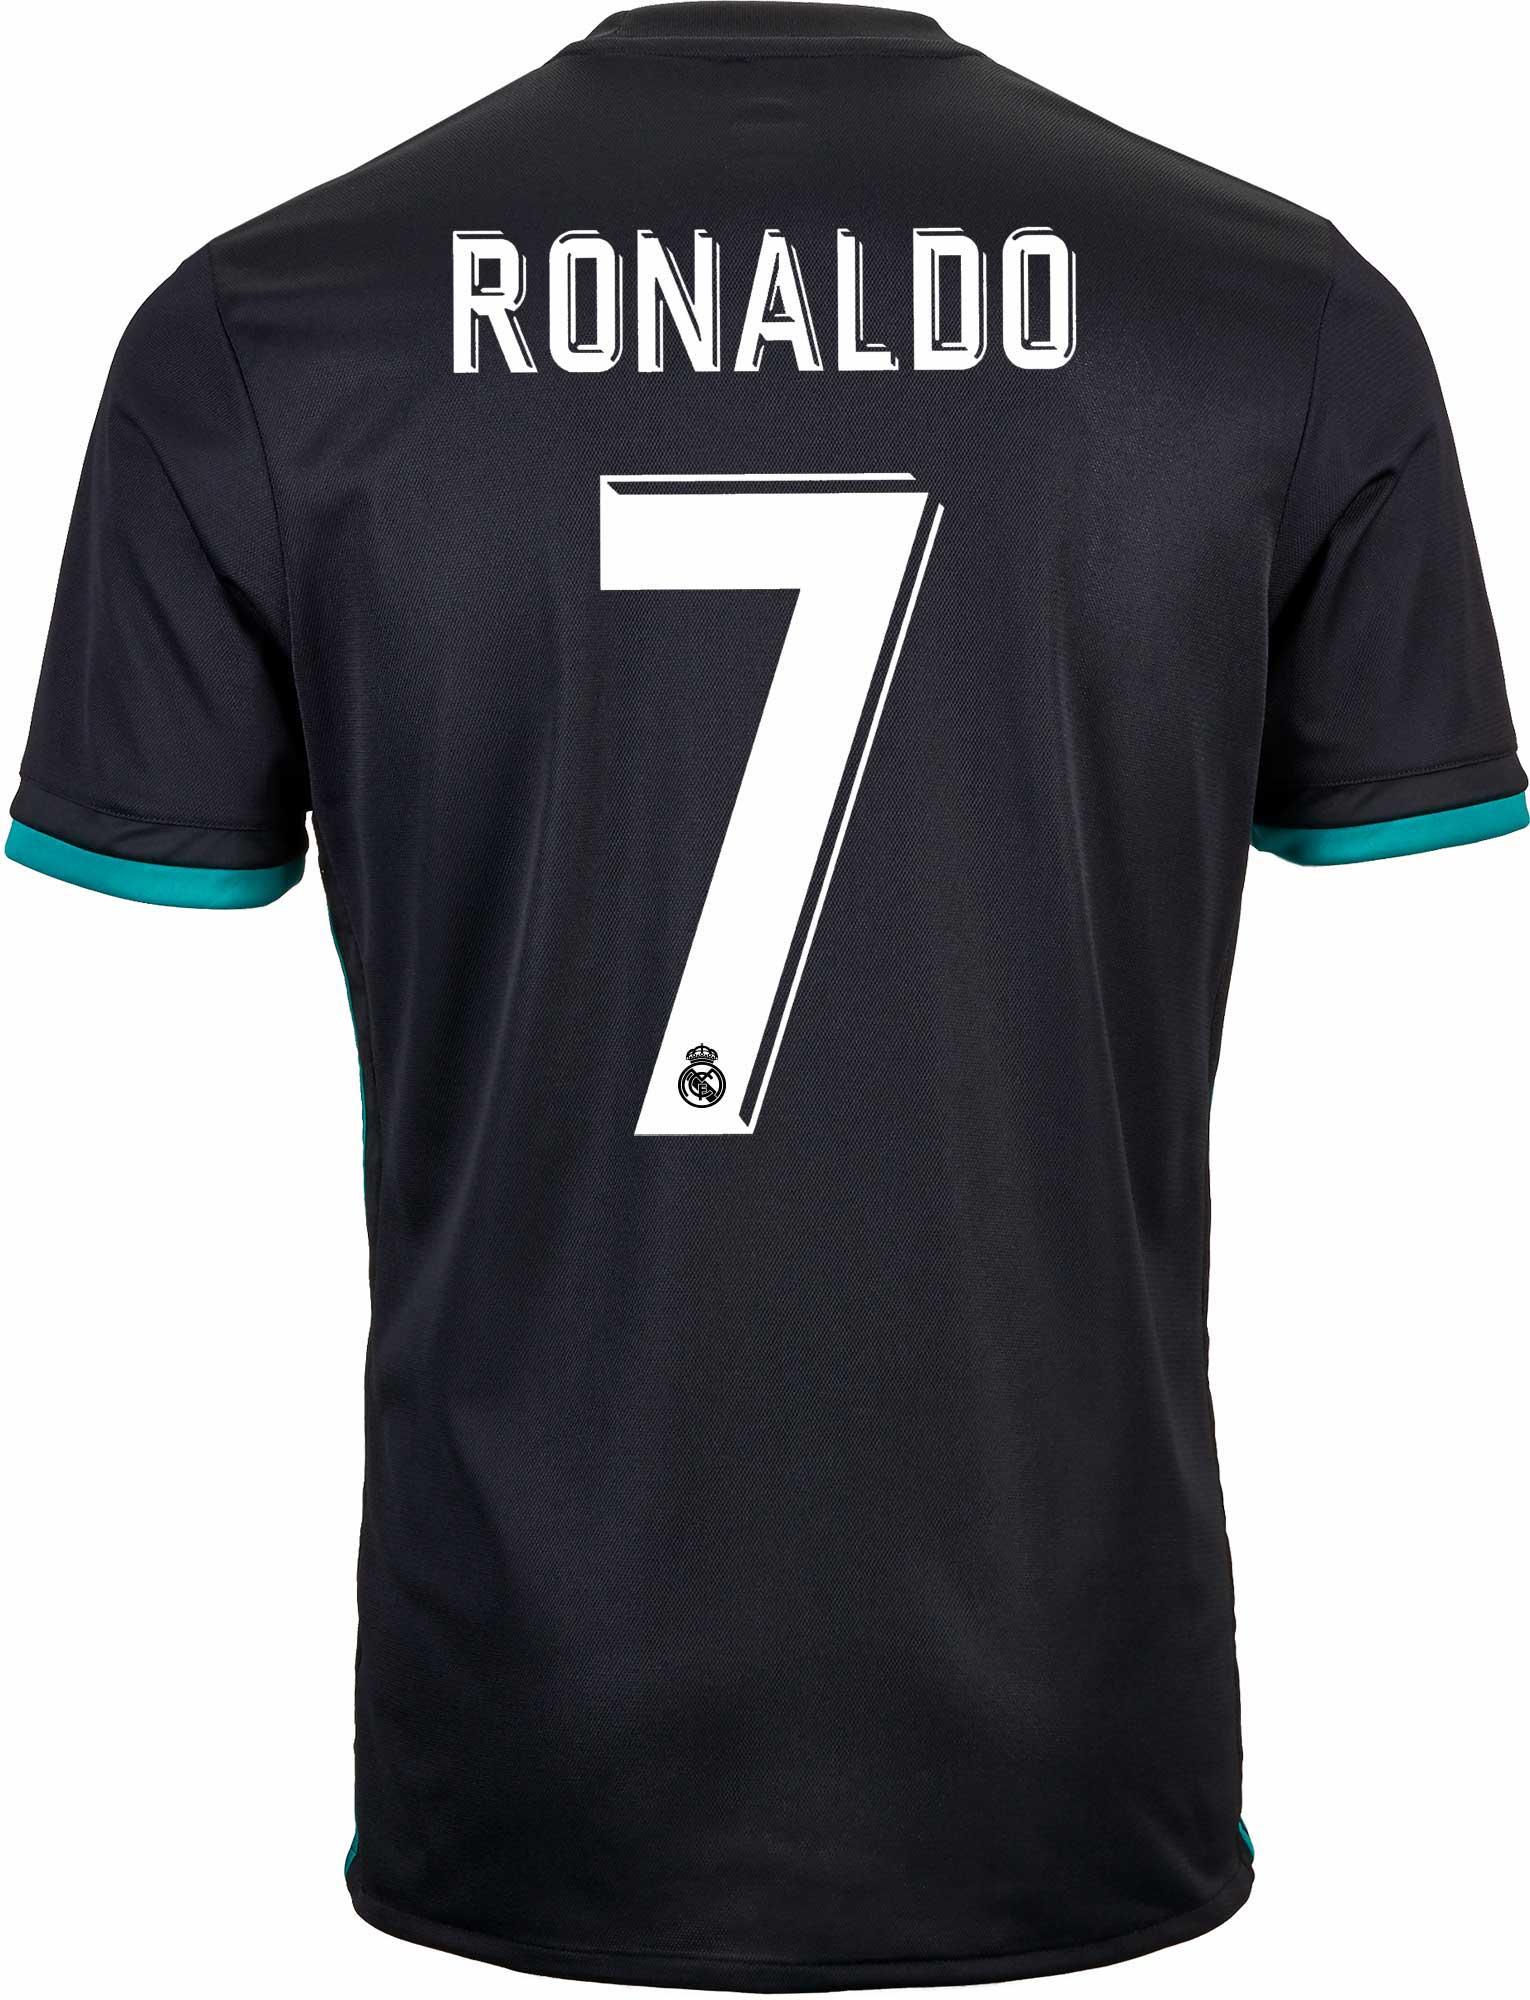 promo code 1c9c6 e93a9 adidas Kids Cristiano Ronaldo Real Madrid Away Jersey 2017-18